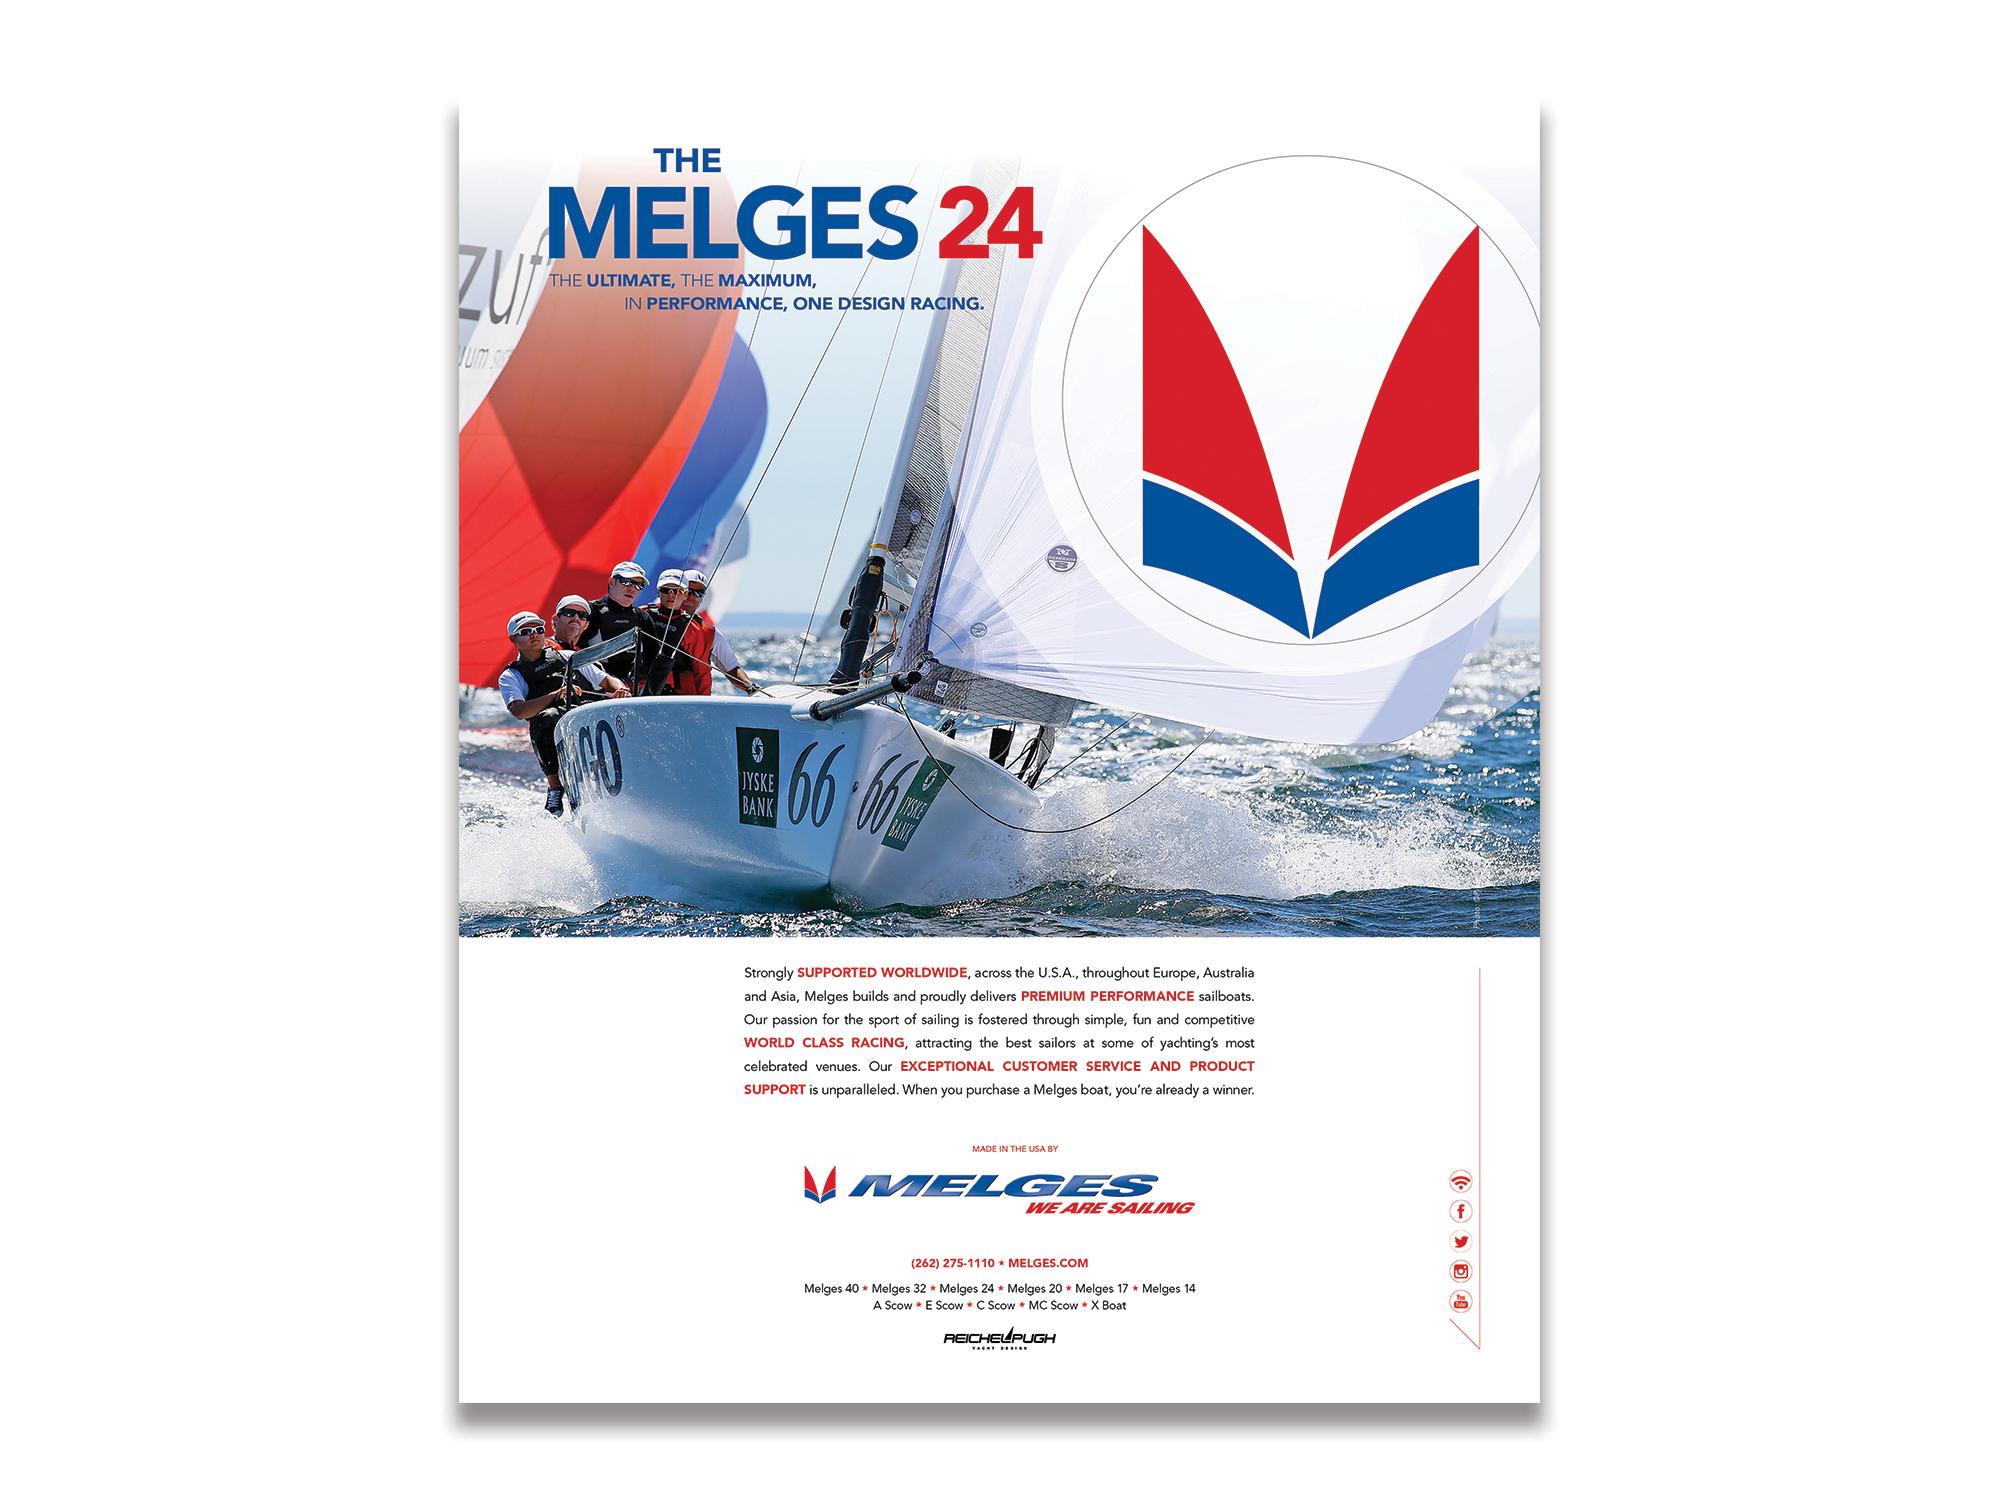 melg-m24ad-sw-1.jpg